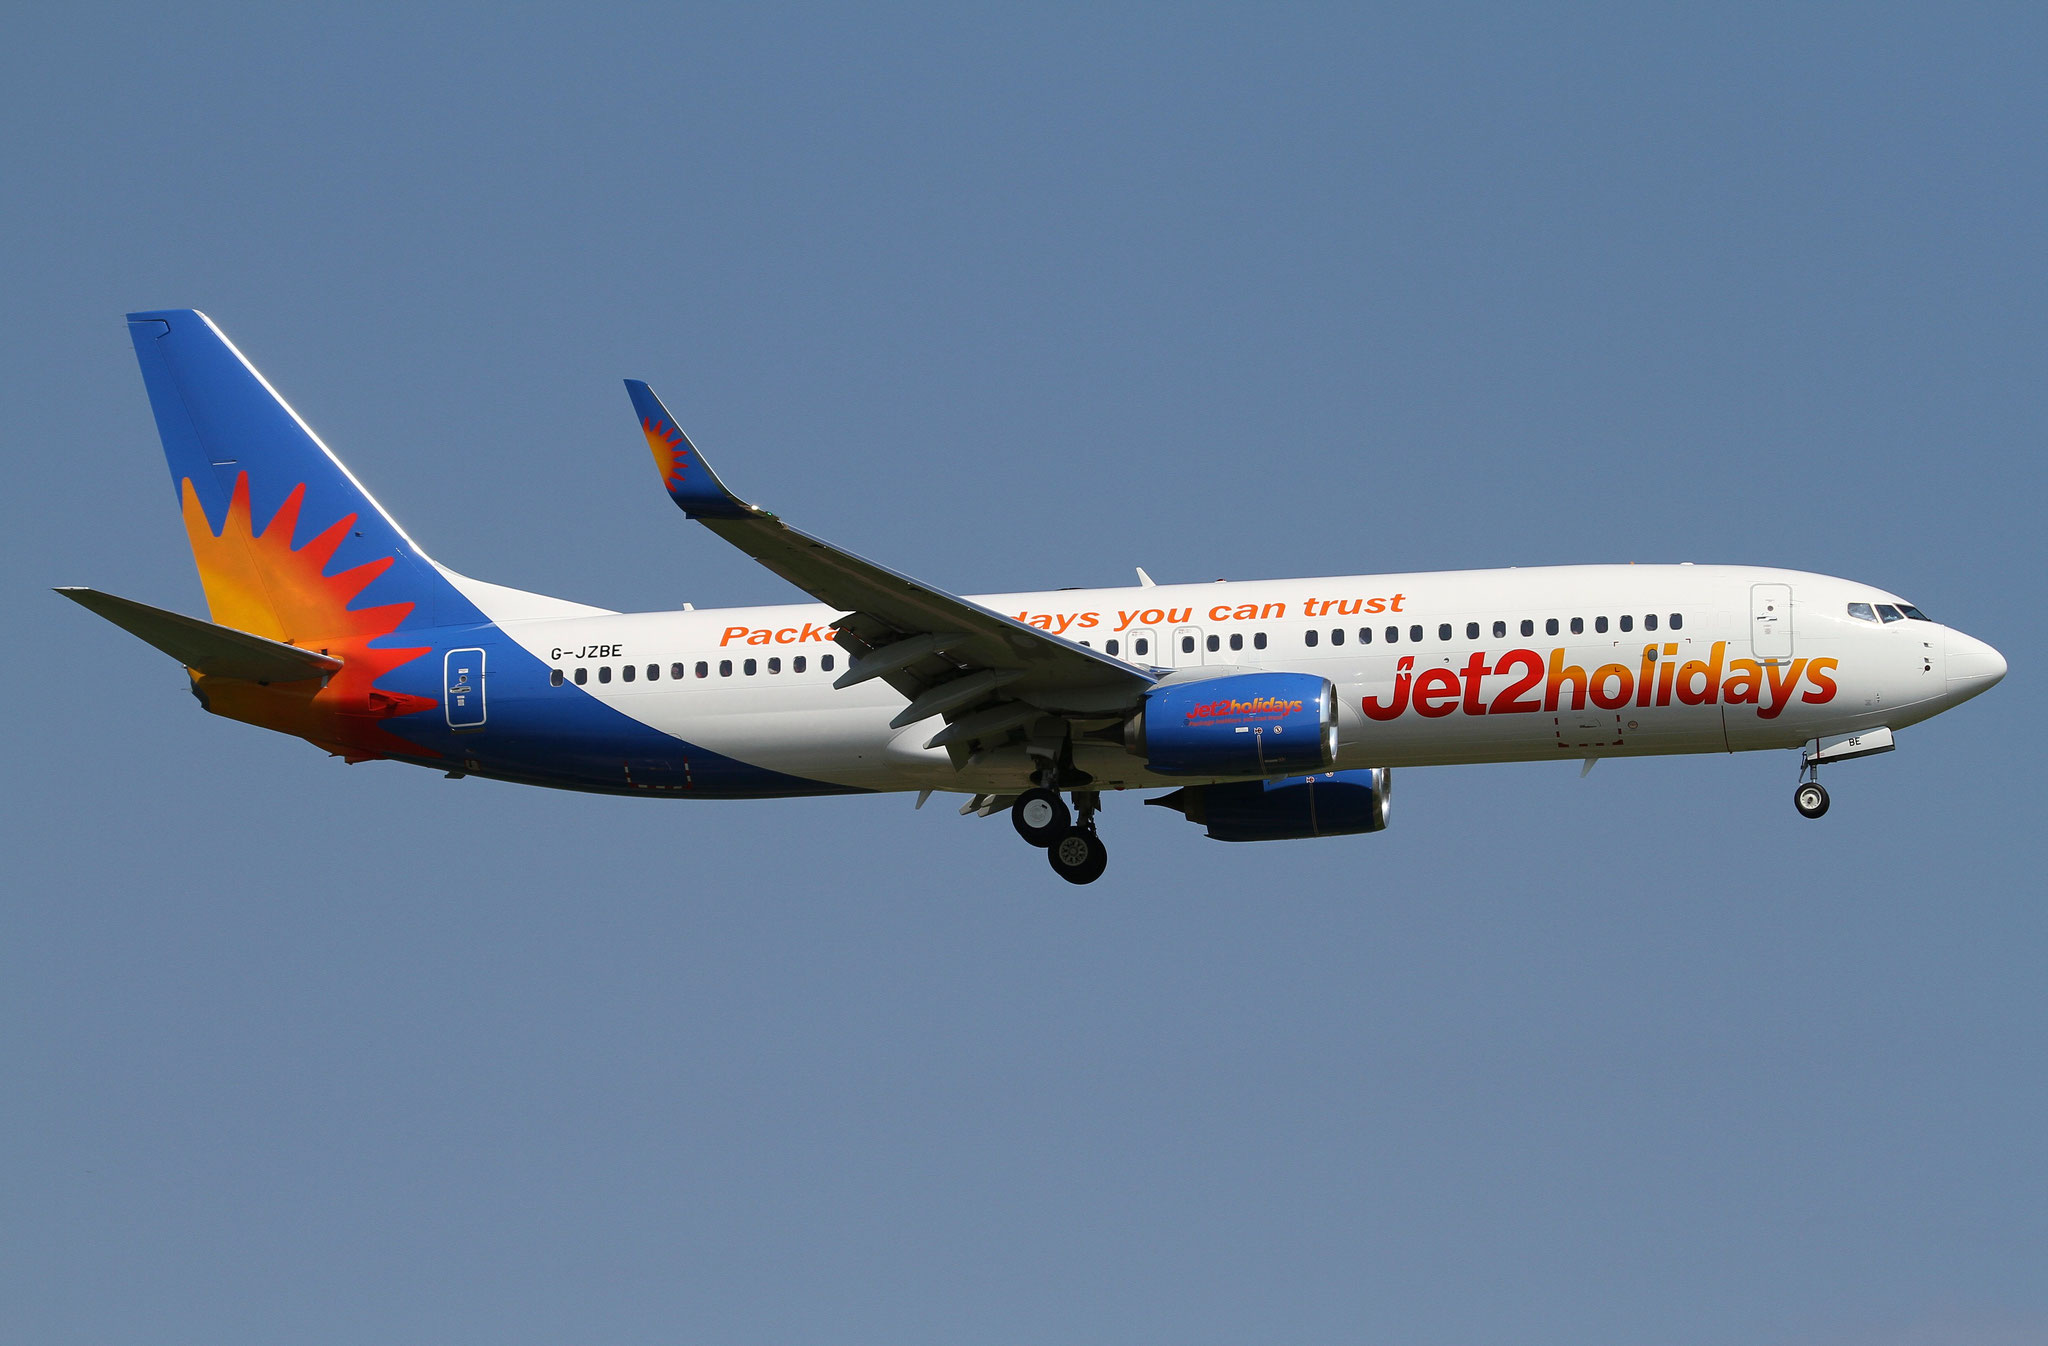 G-JZBE B737-800 63161/6703 Jet2